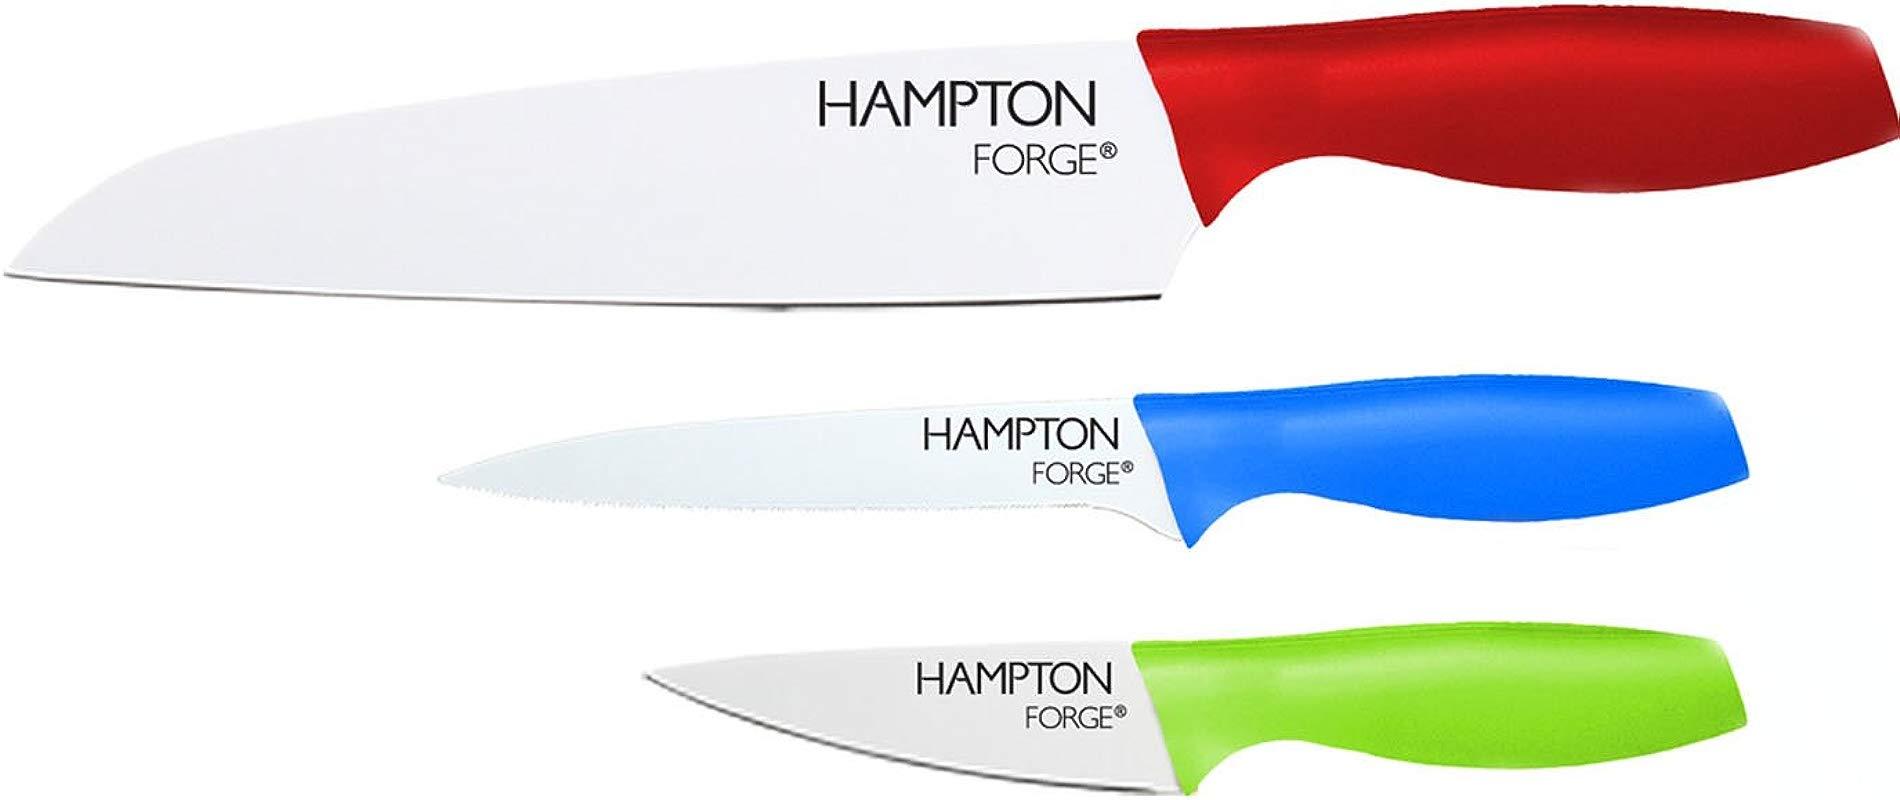 Hampton Forge 3 Piece Tomodachi Ceramic Coated Cutlery Set Metallic